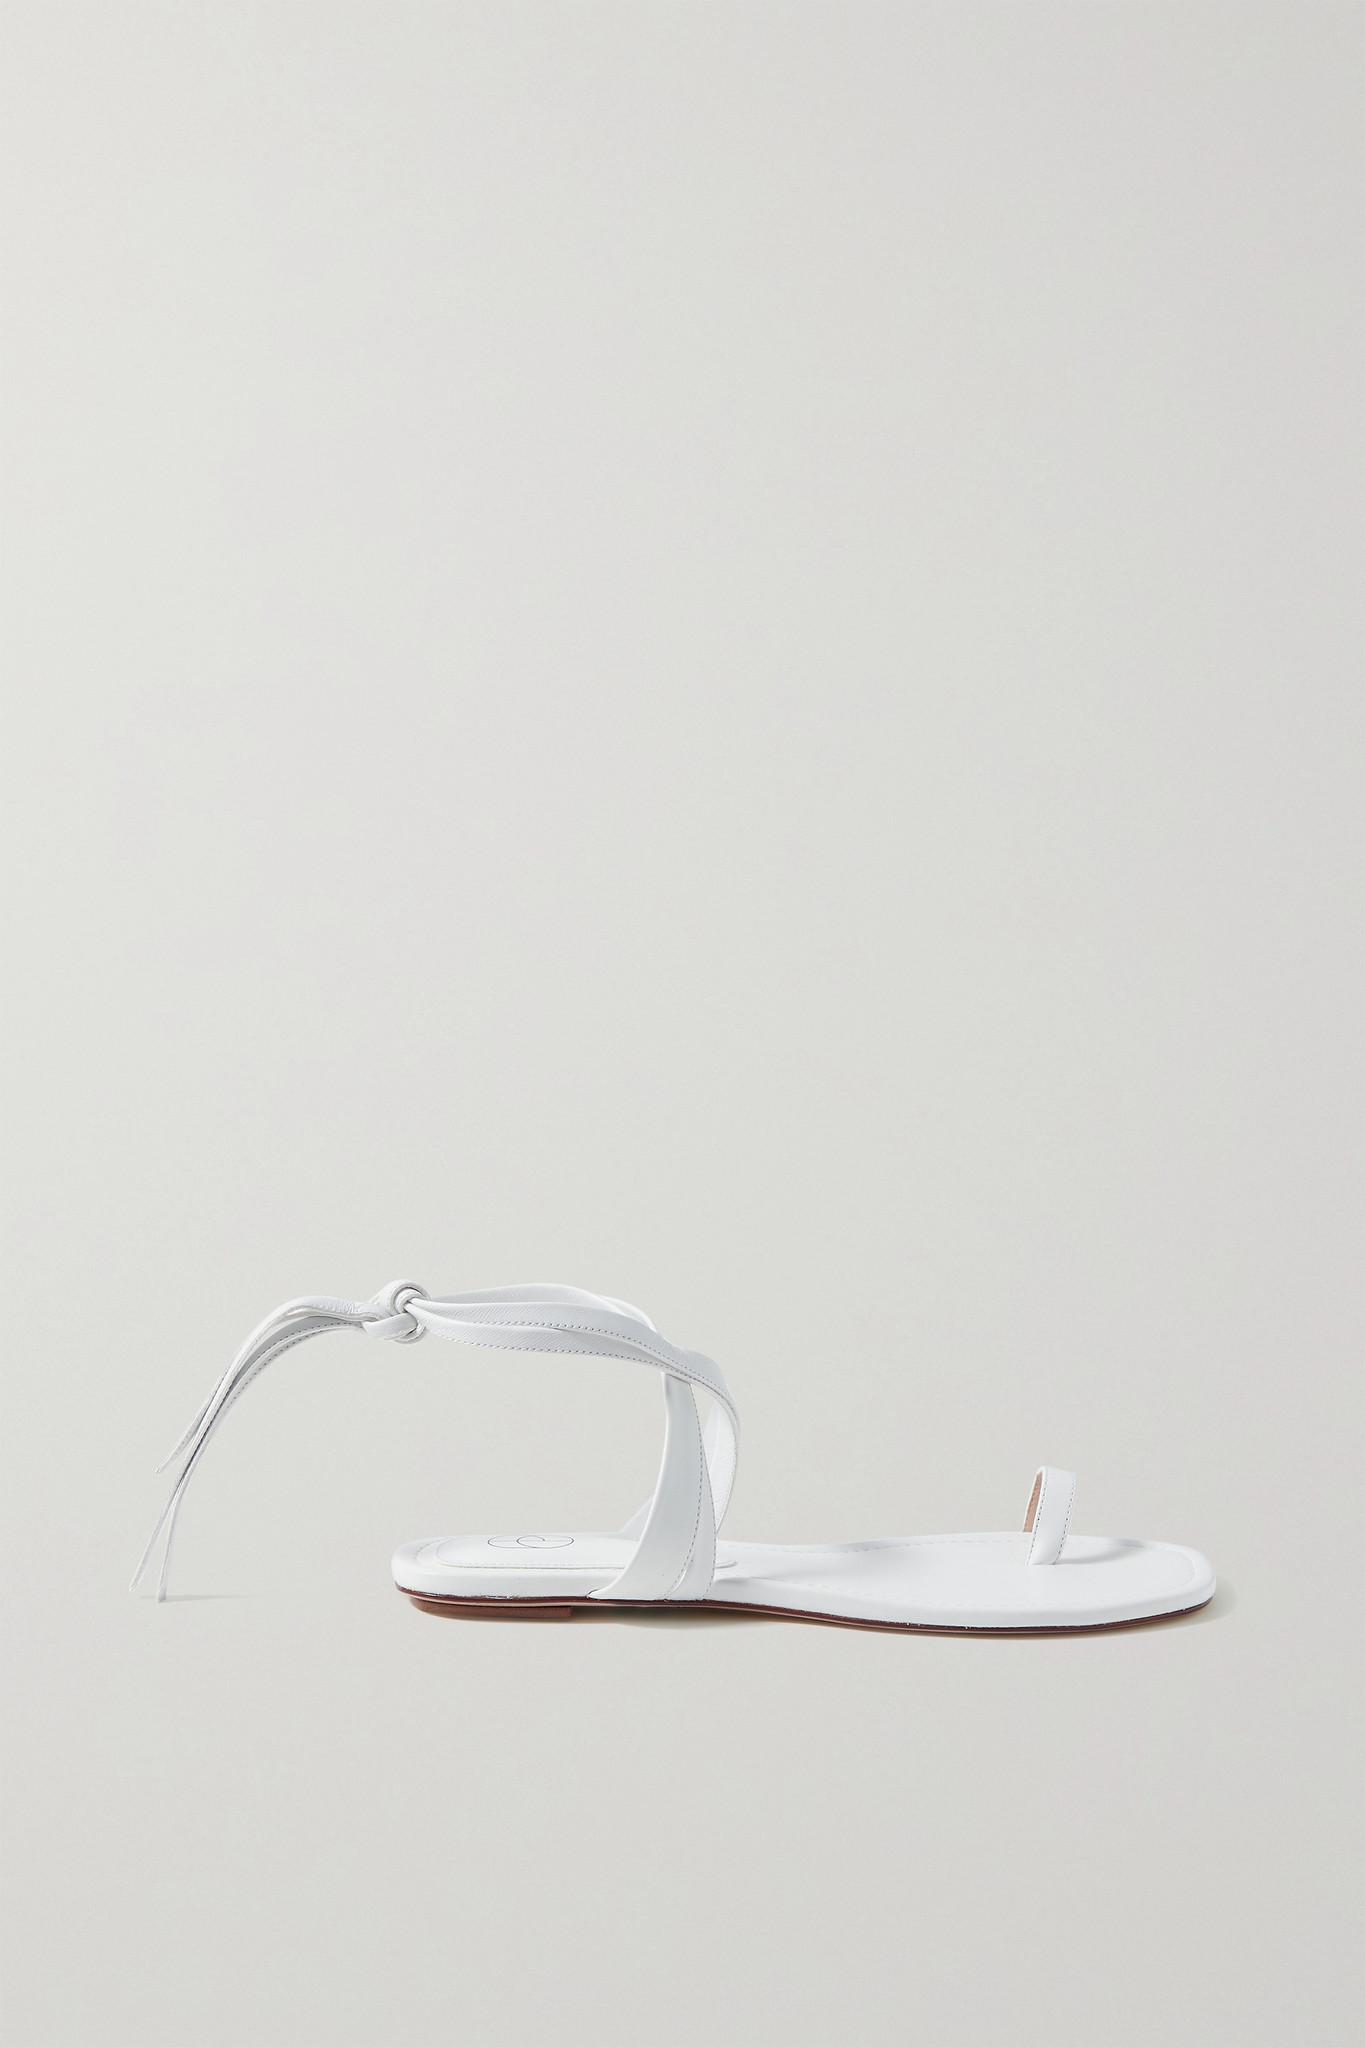 PORTE & PAIRE - 皮革凉鞋 - 白色 - IT40